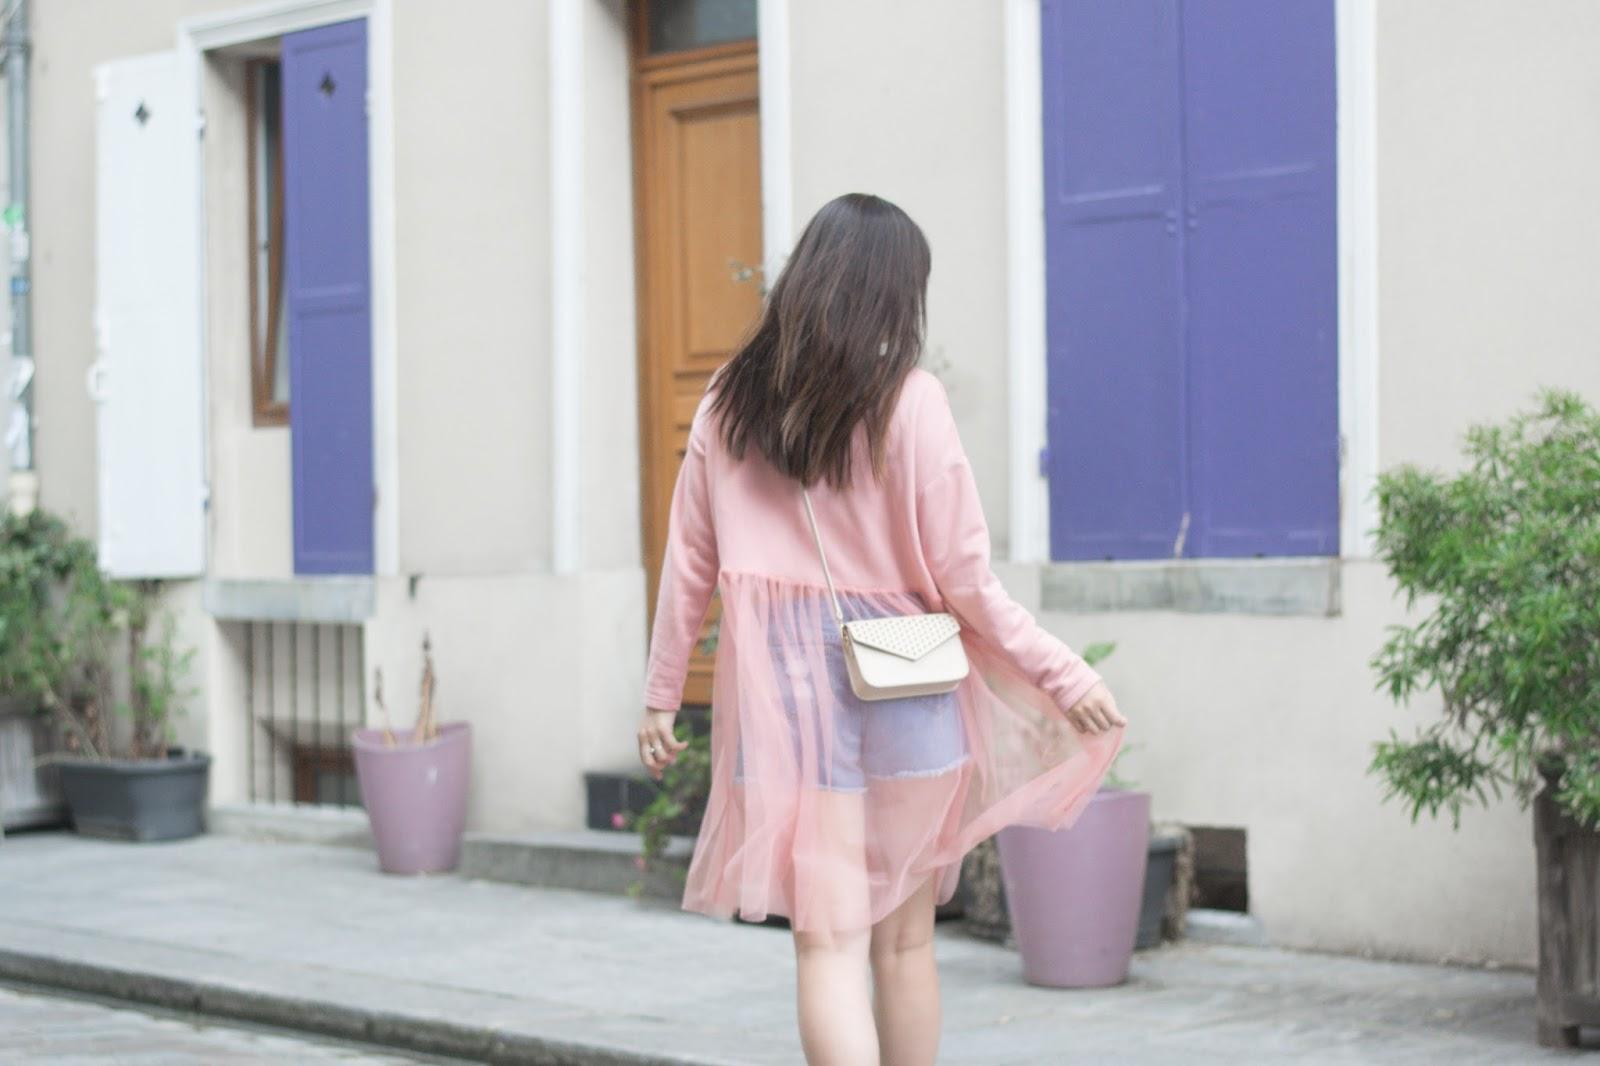 meetmeinparee-paris-rue cremieux-style-parisblogger-streetstyle